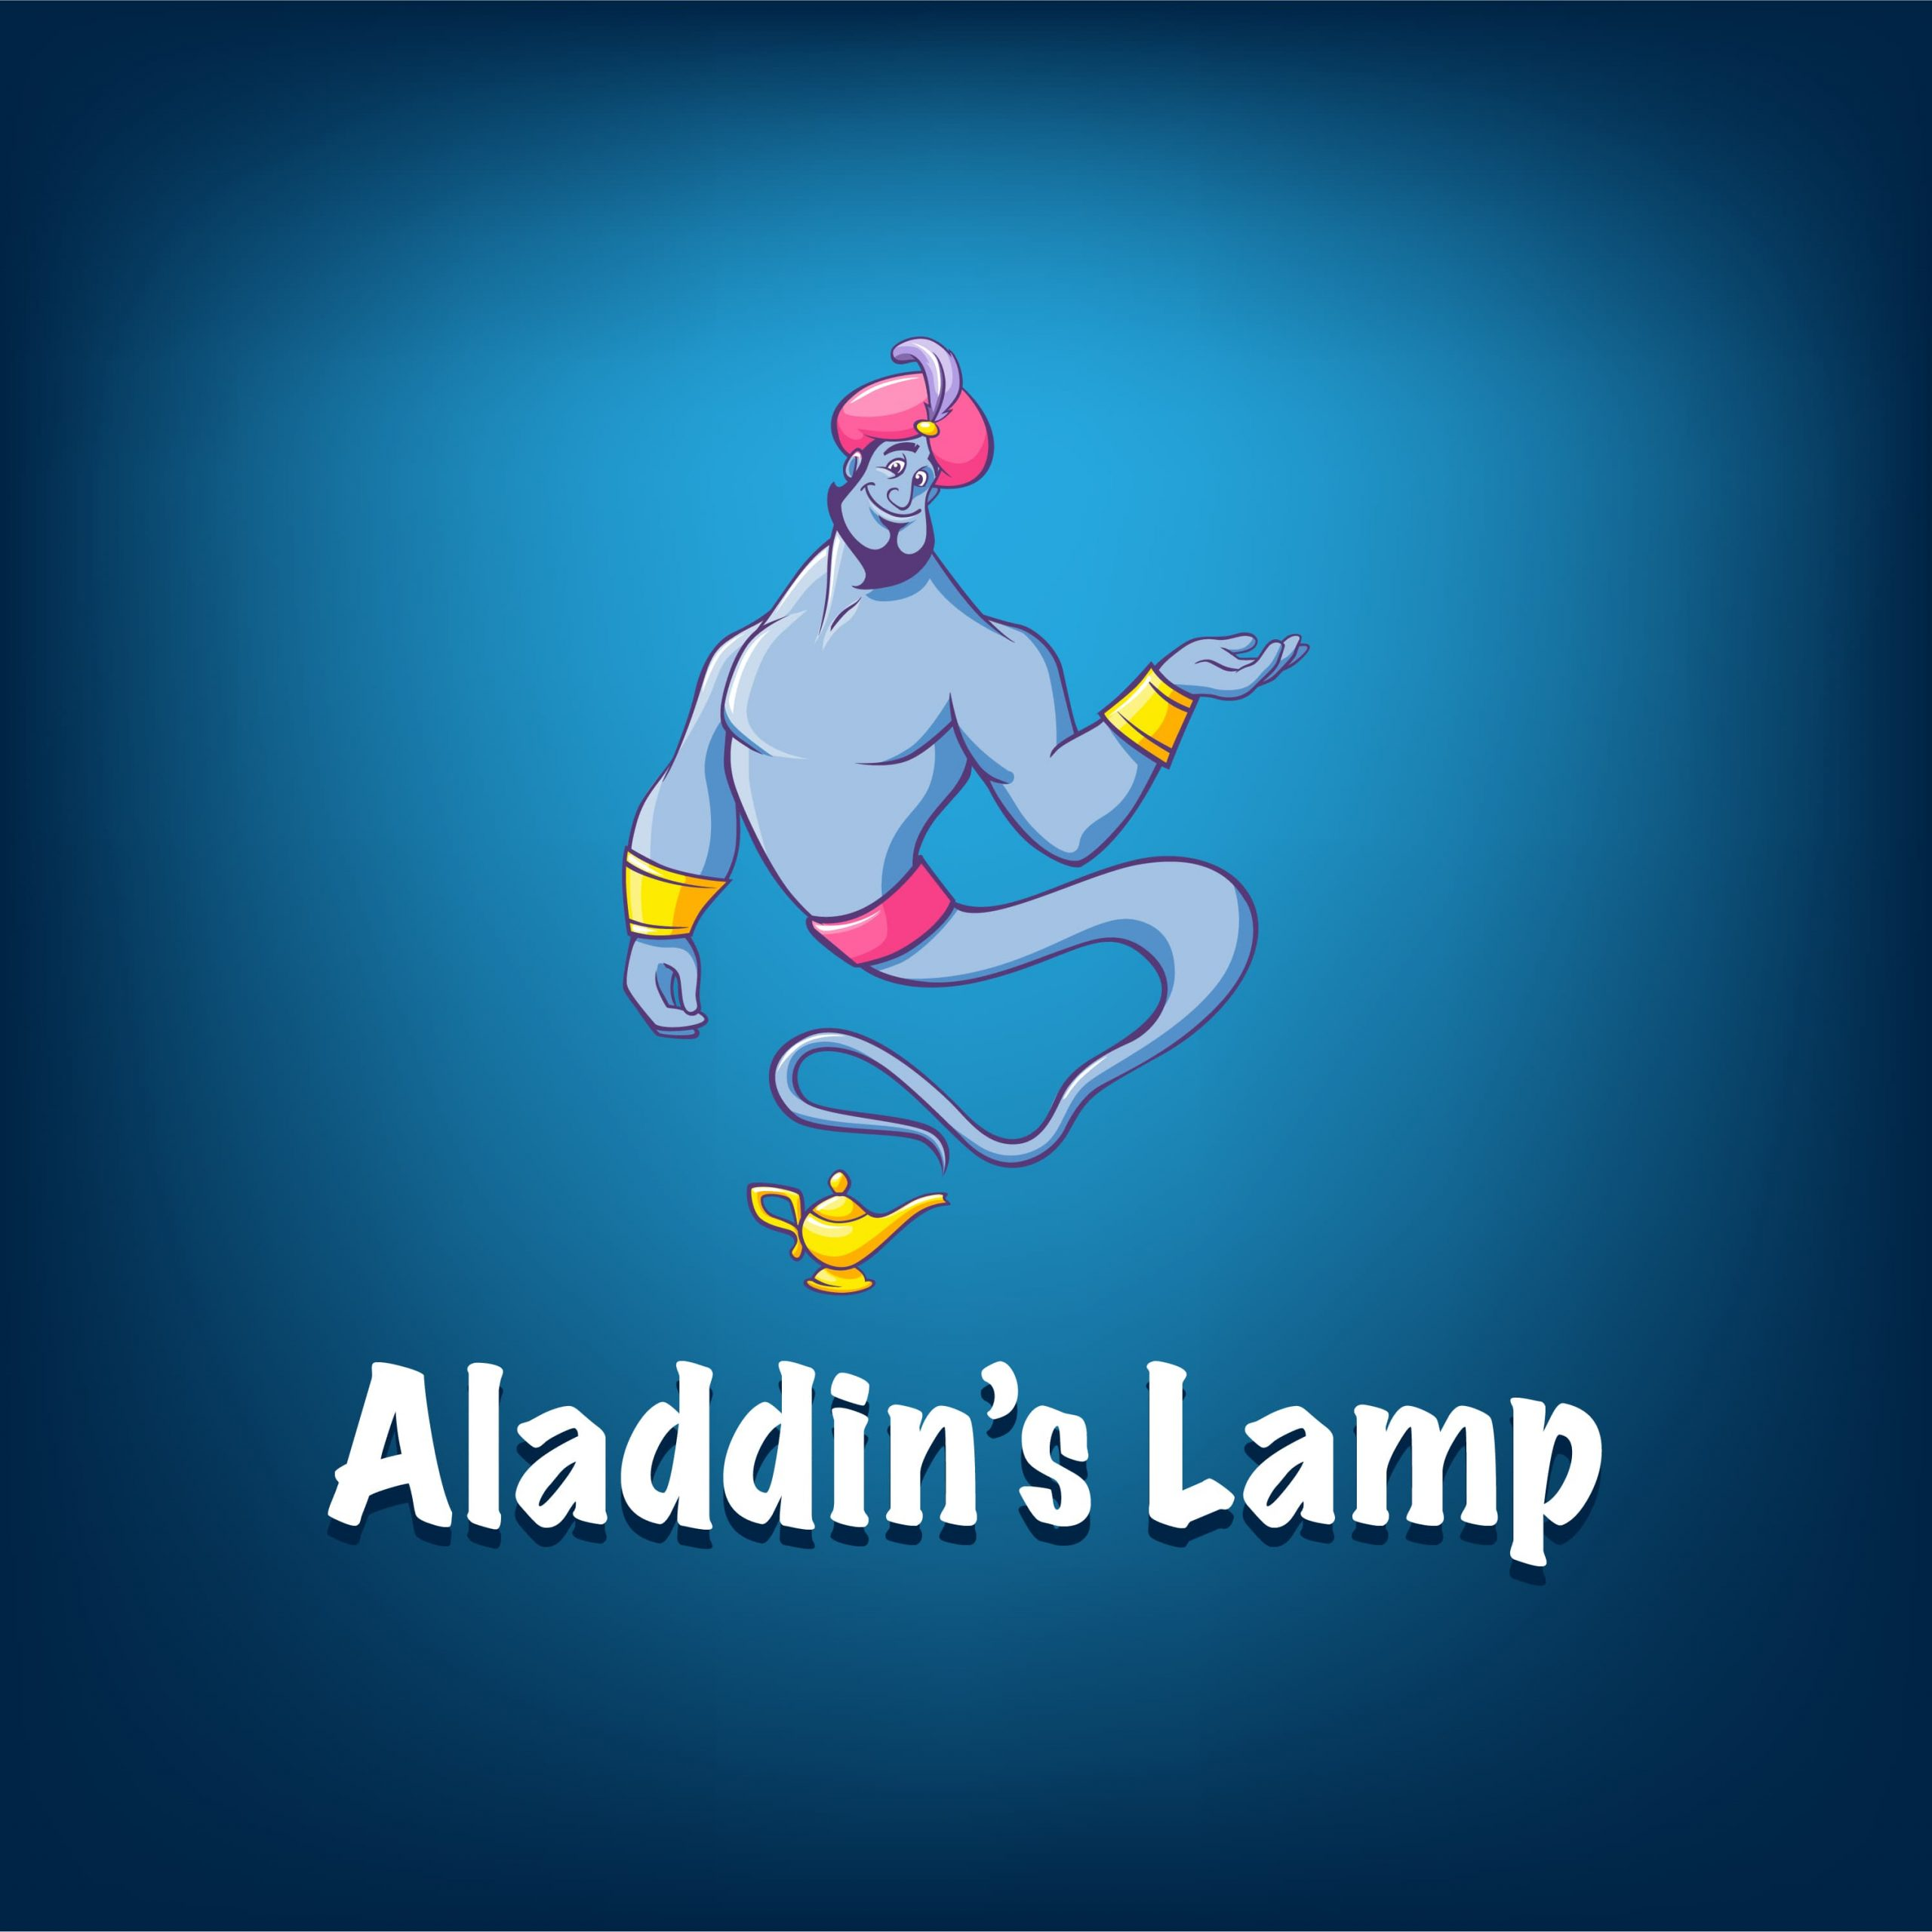 aladdins-lamp